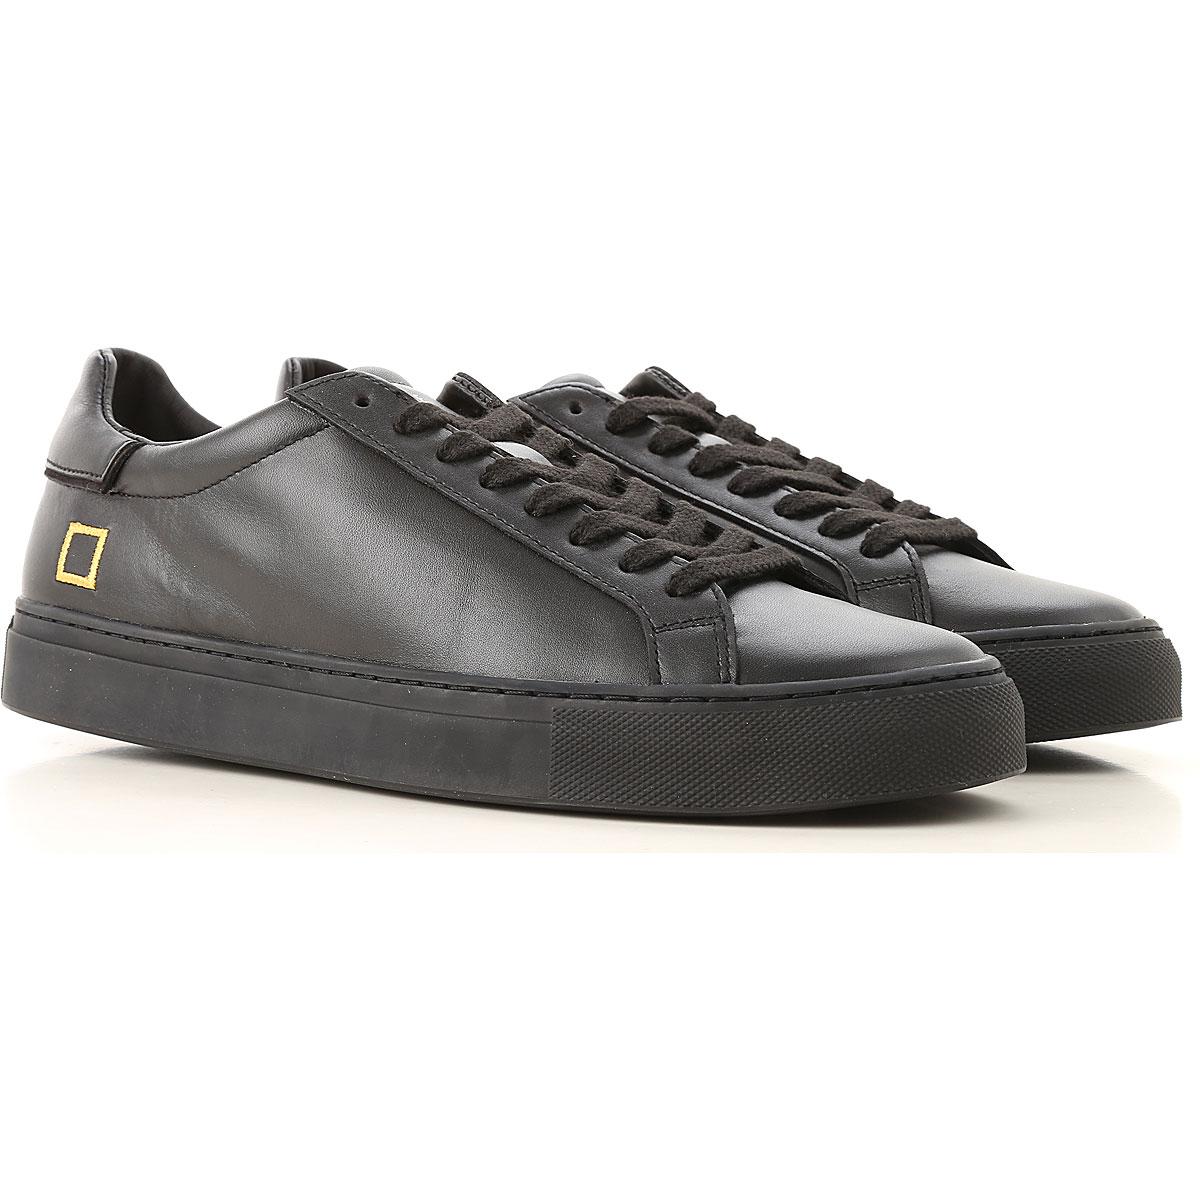 Image of D.A.T.E. Sneakers for Men, Black, Leather, 2017, US 8 - EU 41 - UK 7 - JP 26.5 US 9 - EU 42 - UK 8 - JP 27 US 10 - EU 43 - UK 9 - JP 27.5 US 11 - EU 44 - UK 10 - JP 28 US 12 - EU 45 - UK 11 - JP 28.5